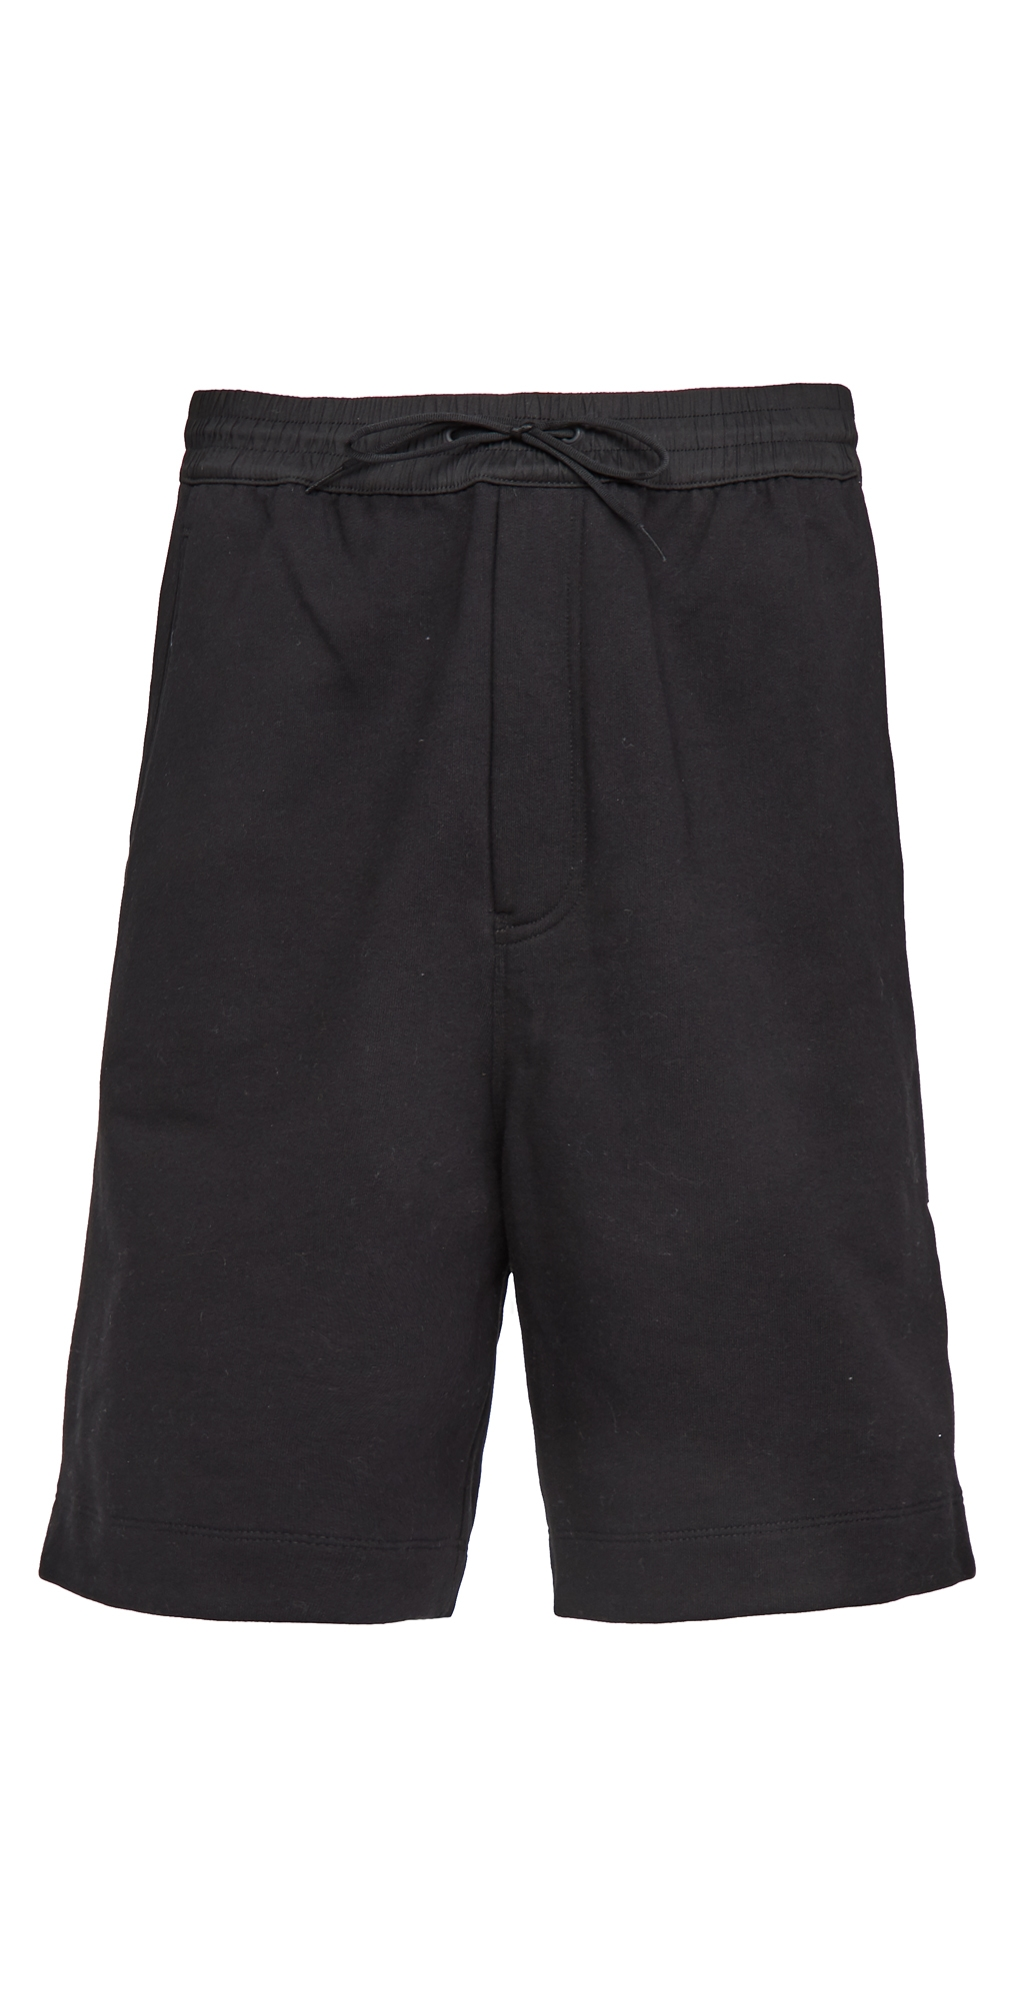 Y-3 Shorts 3 STRIPE TERRY SHORTS